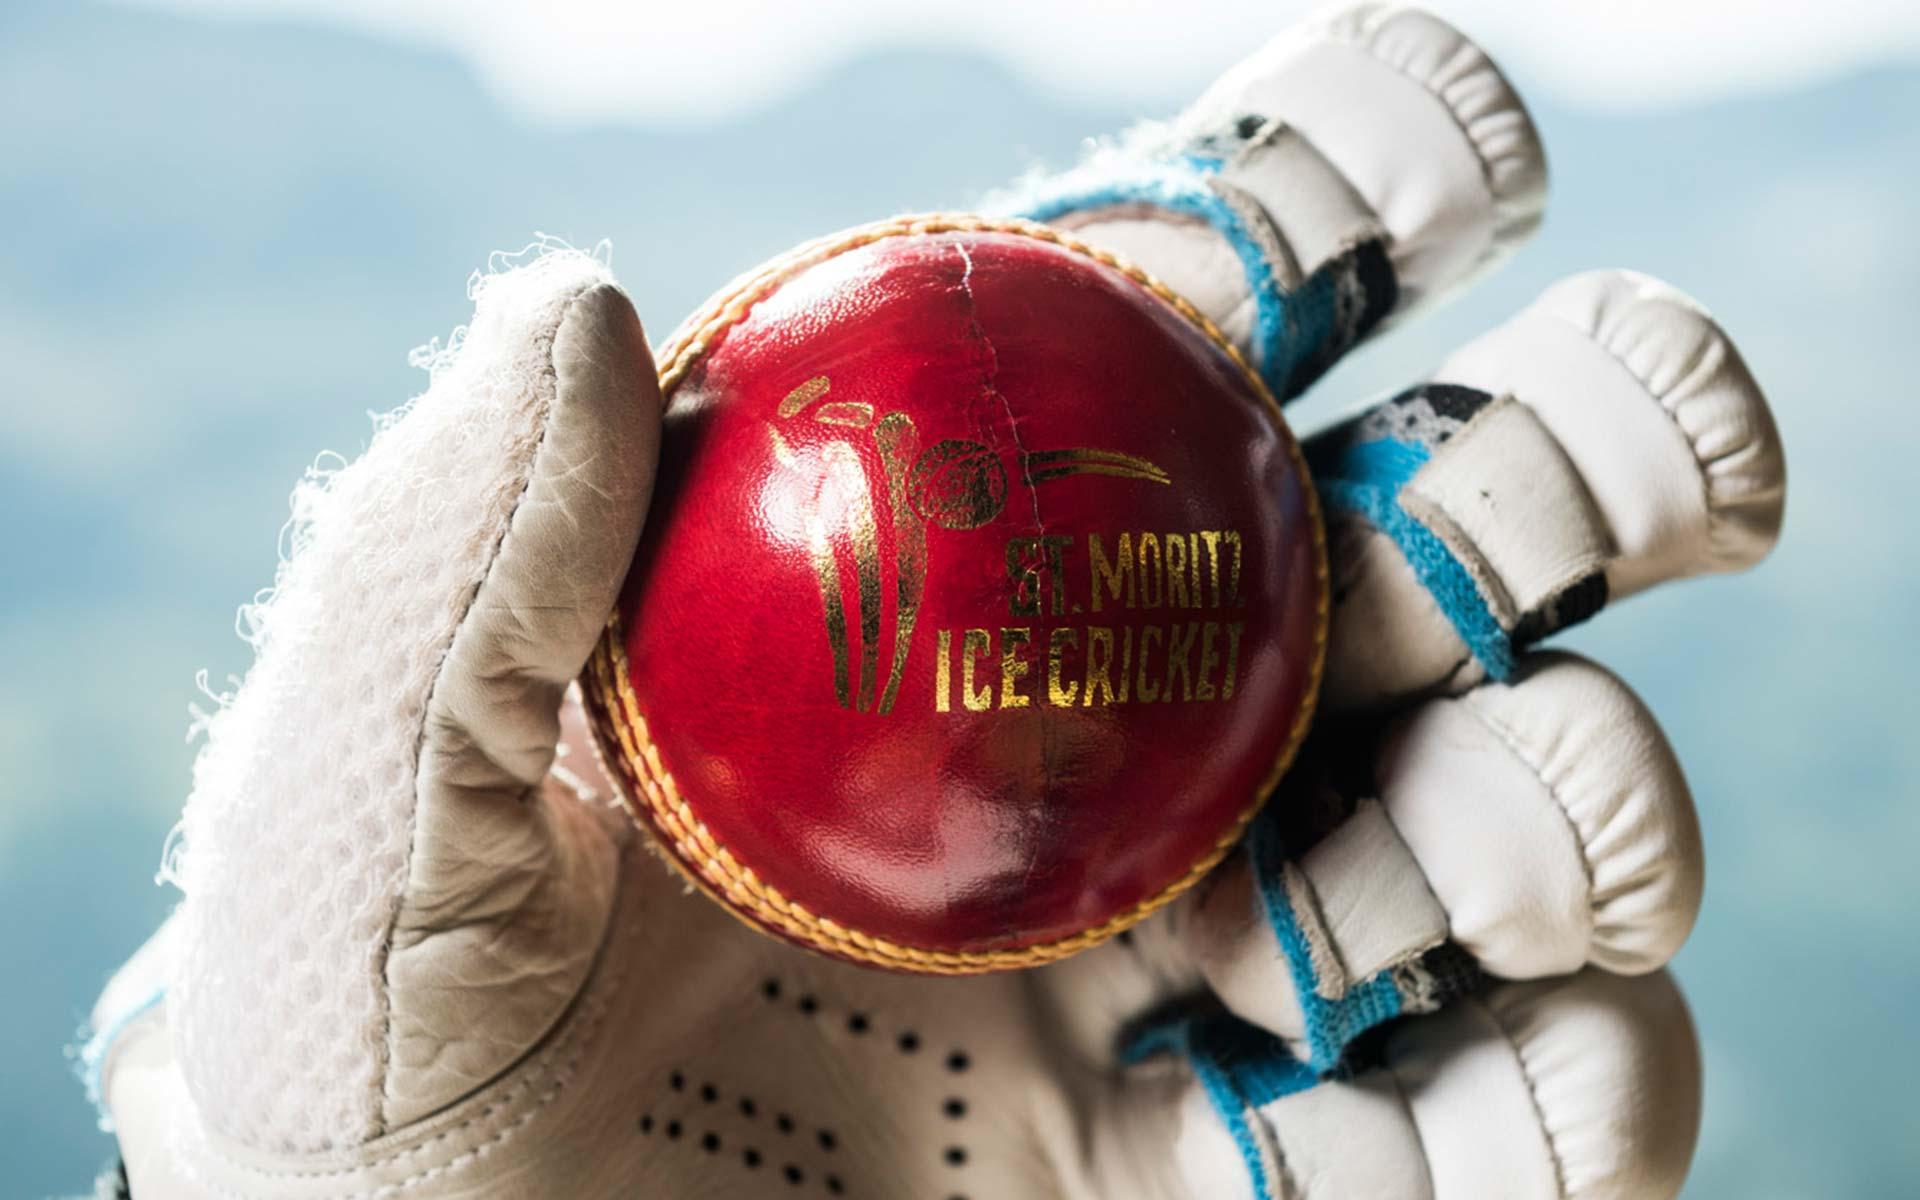 St. Moritz Ice Cricket im Badrutt's Palace Hotel